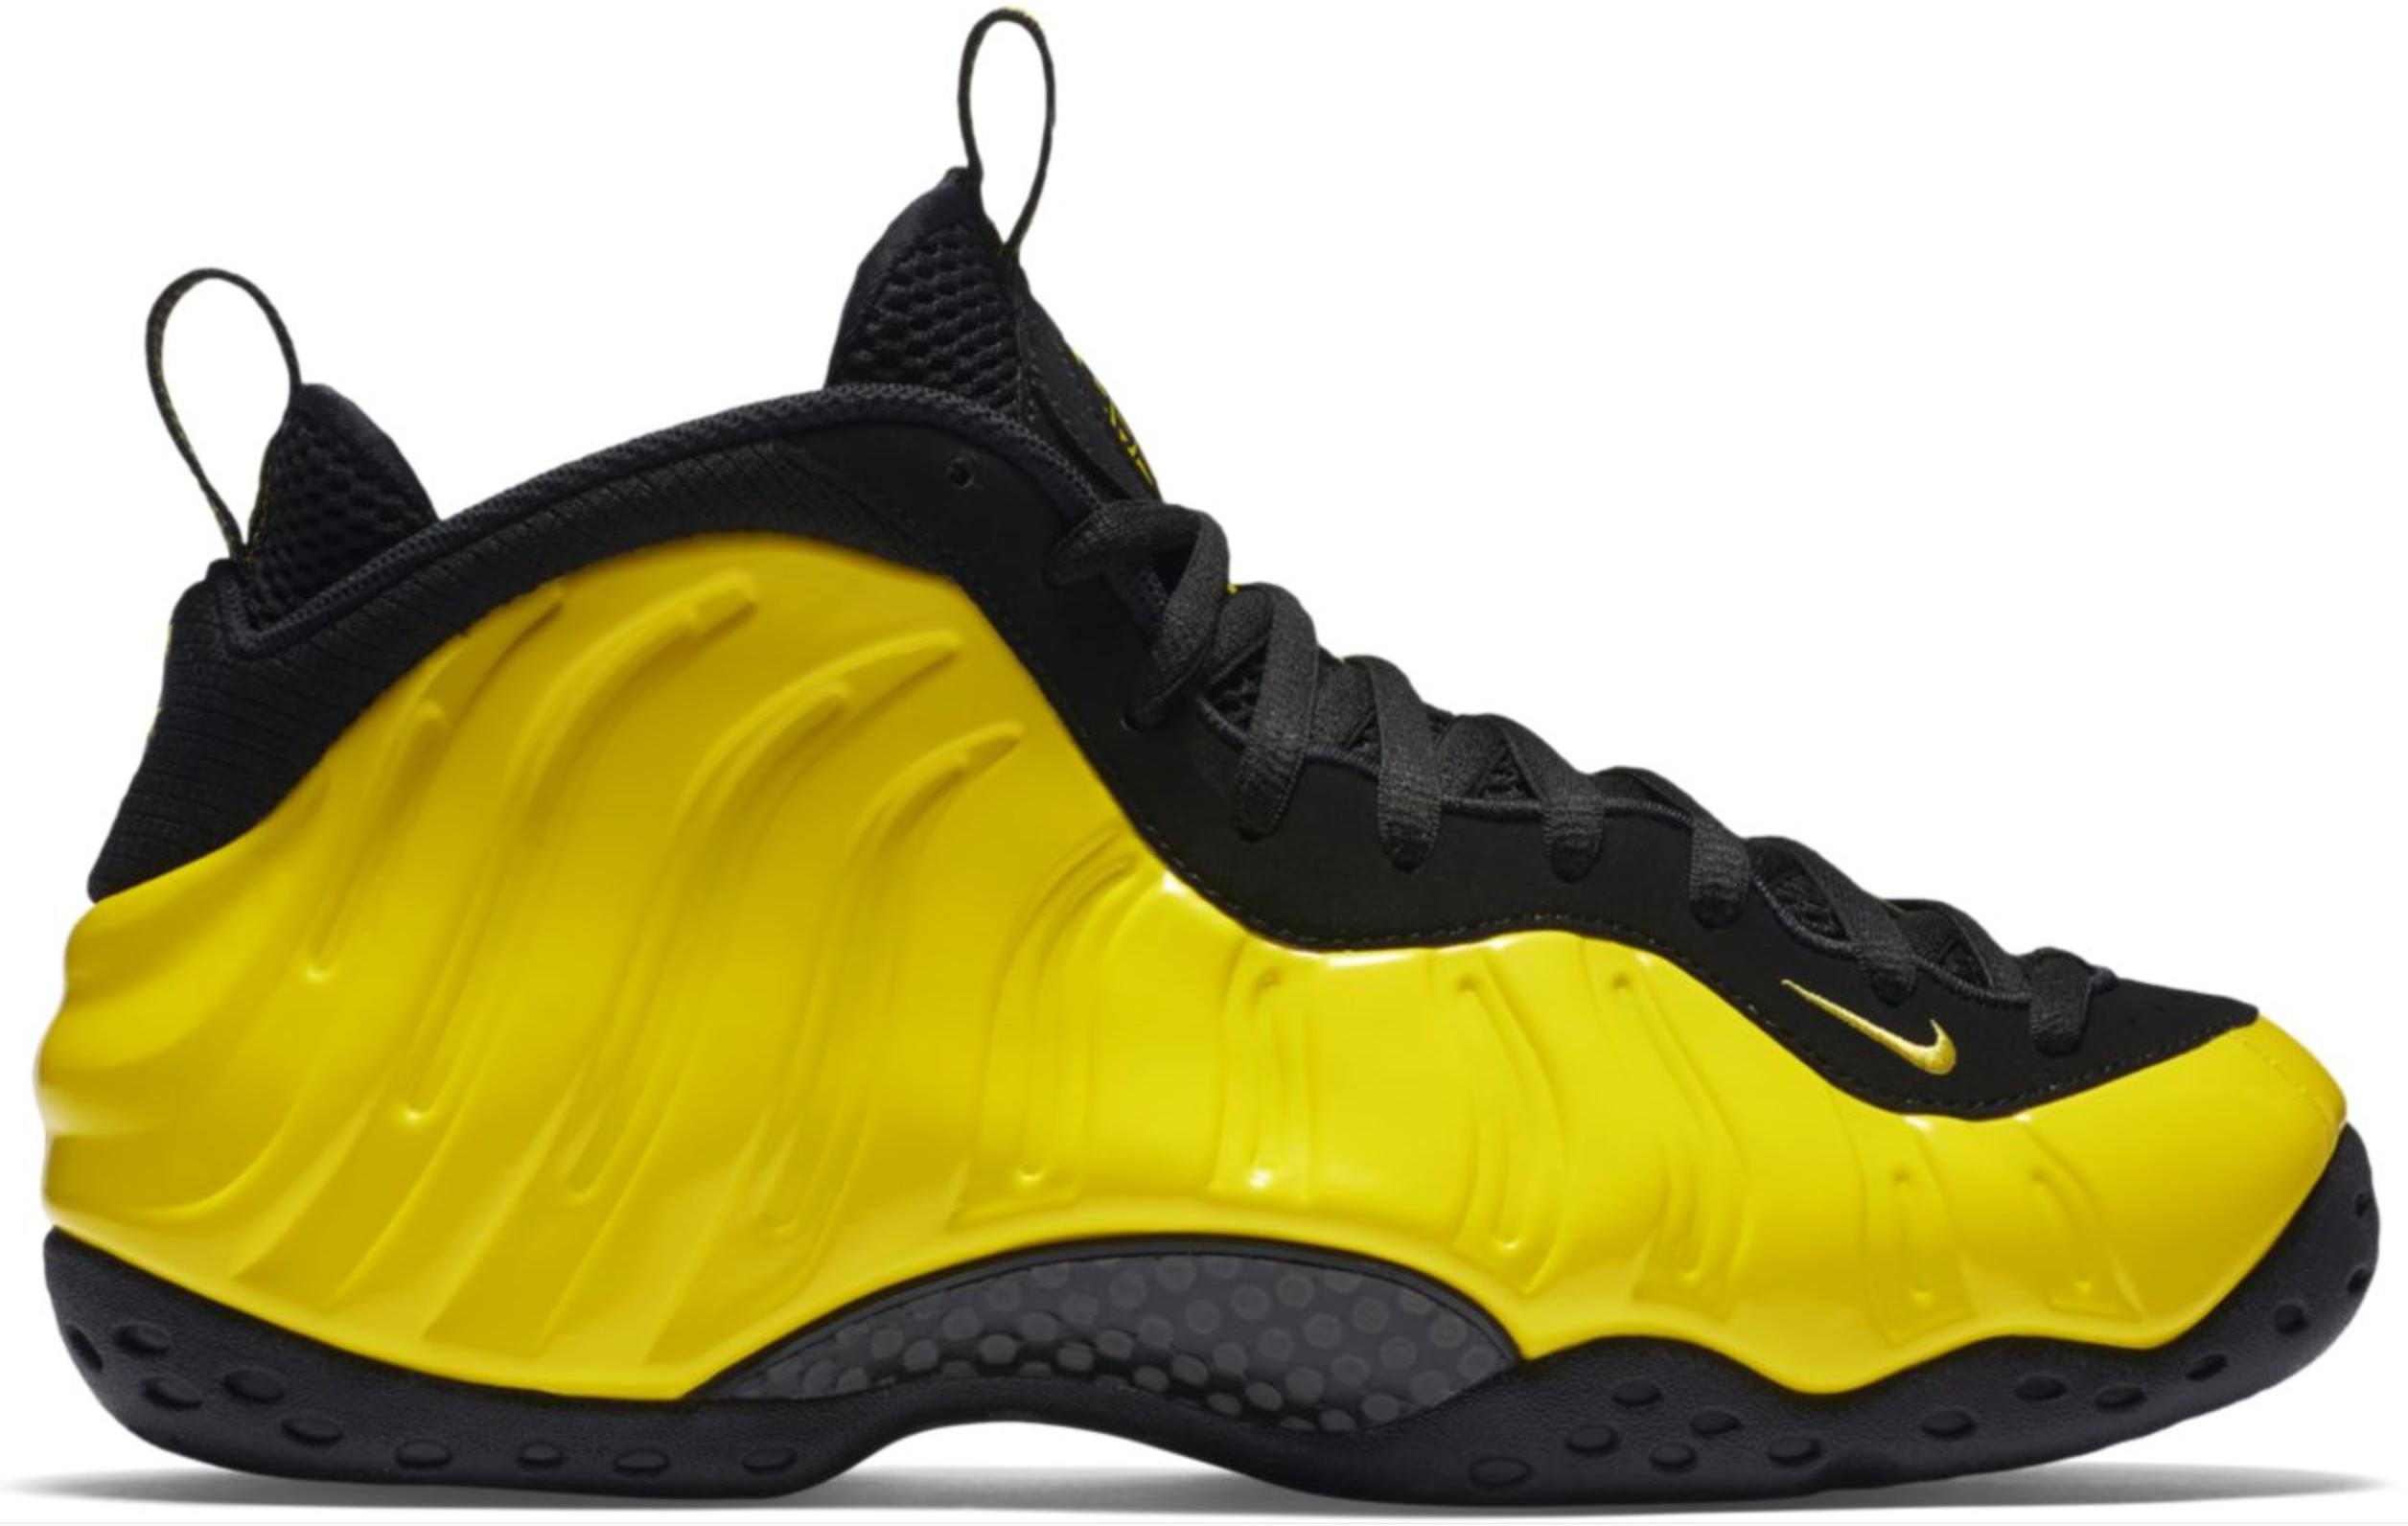 Air Foamposite One Wu-Tang Optic Yellow